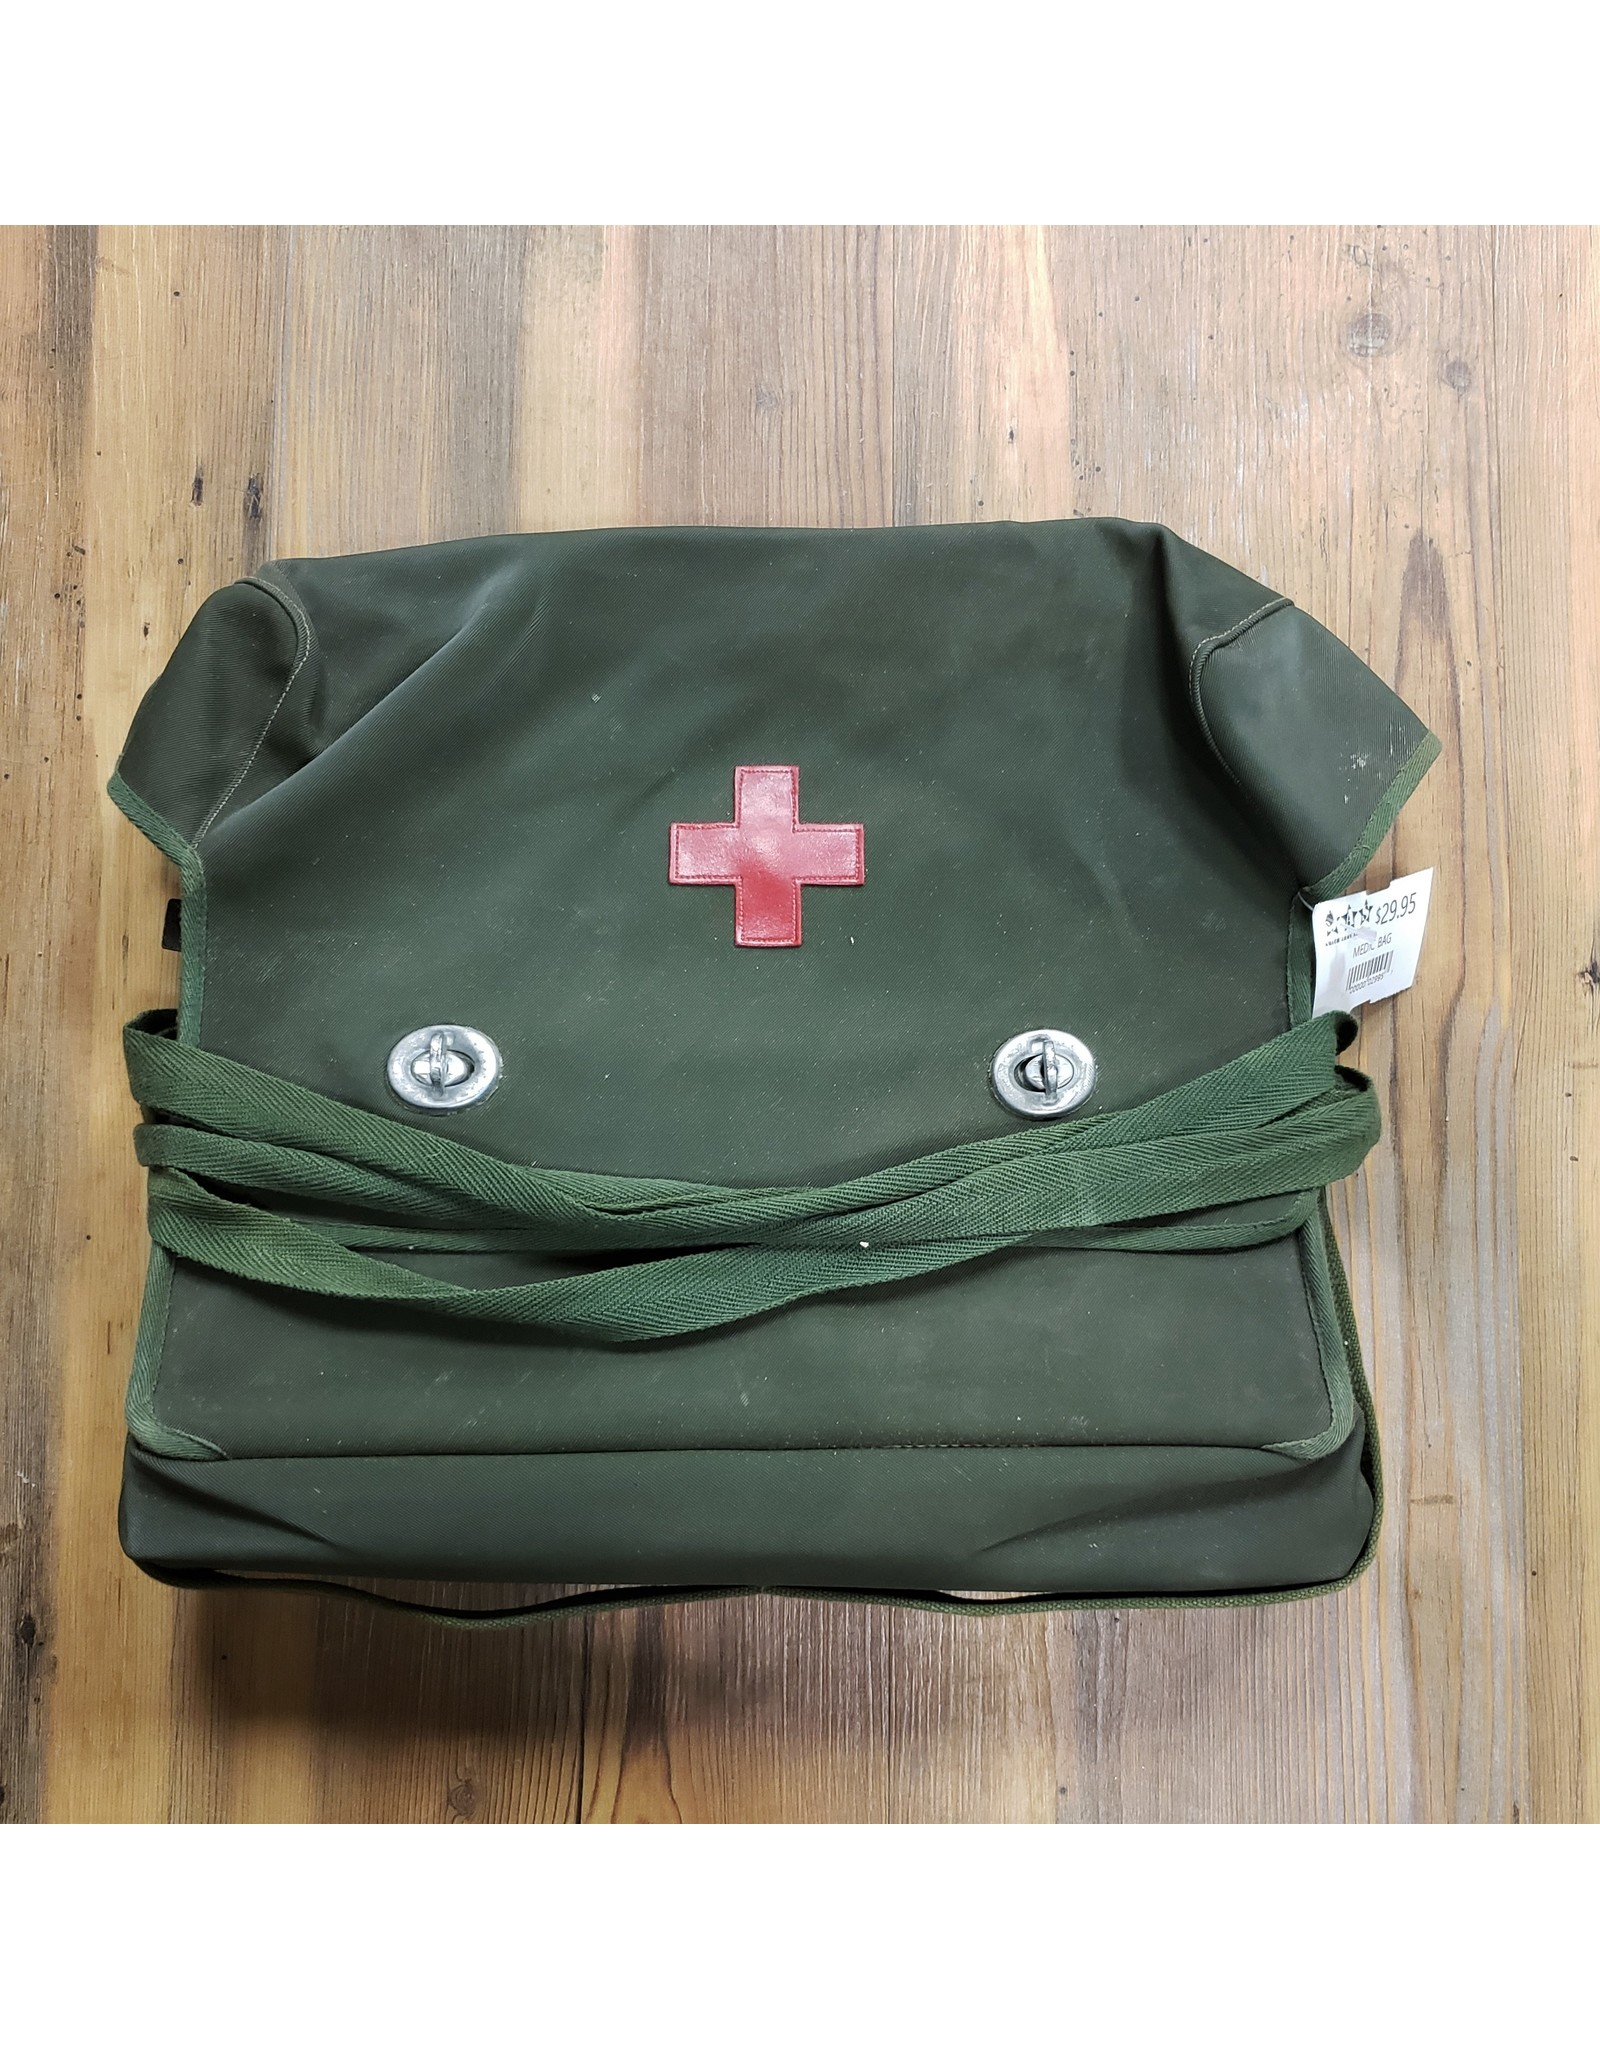 SURPLUS MEDIC BAG